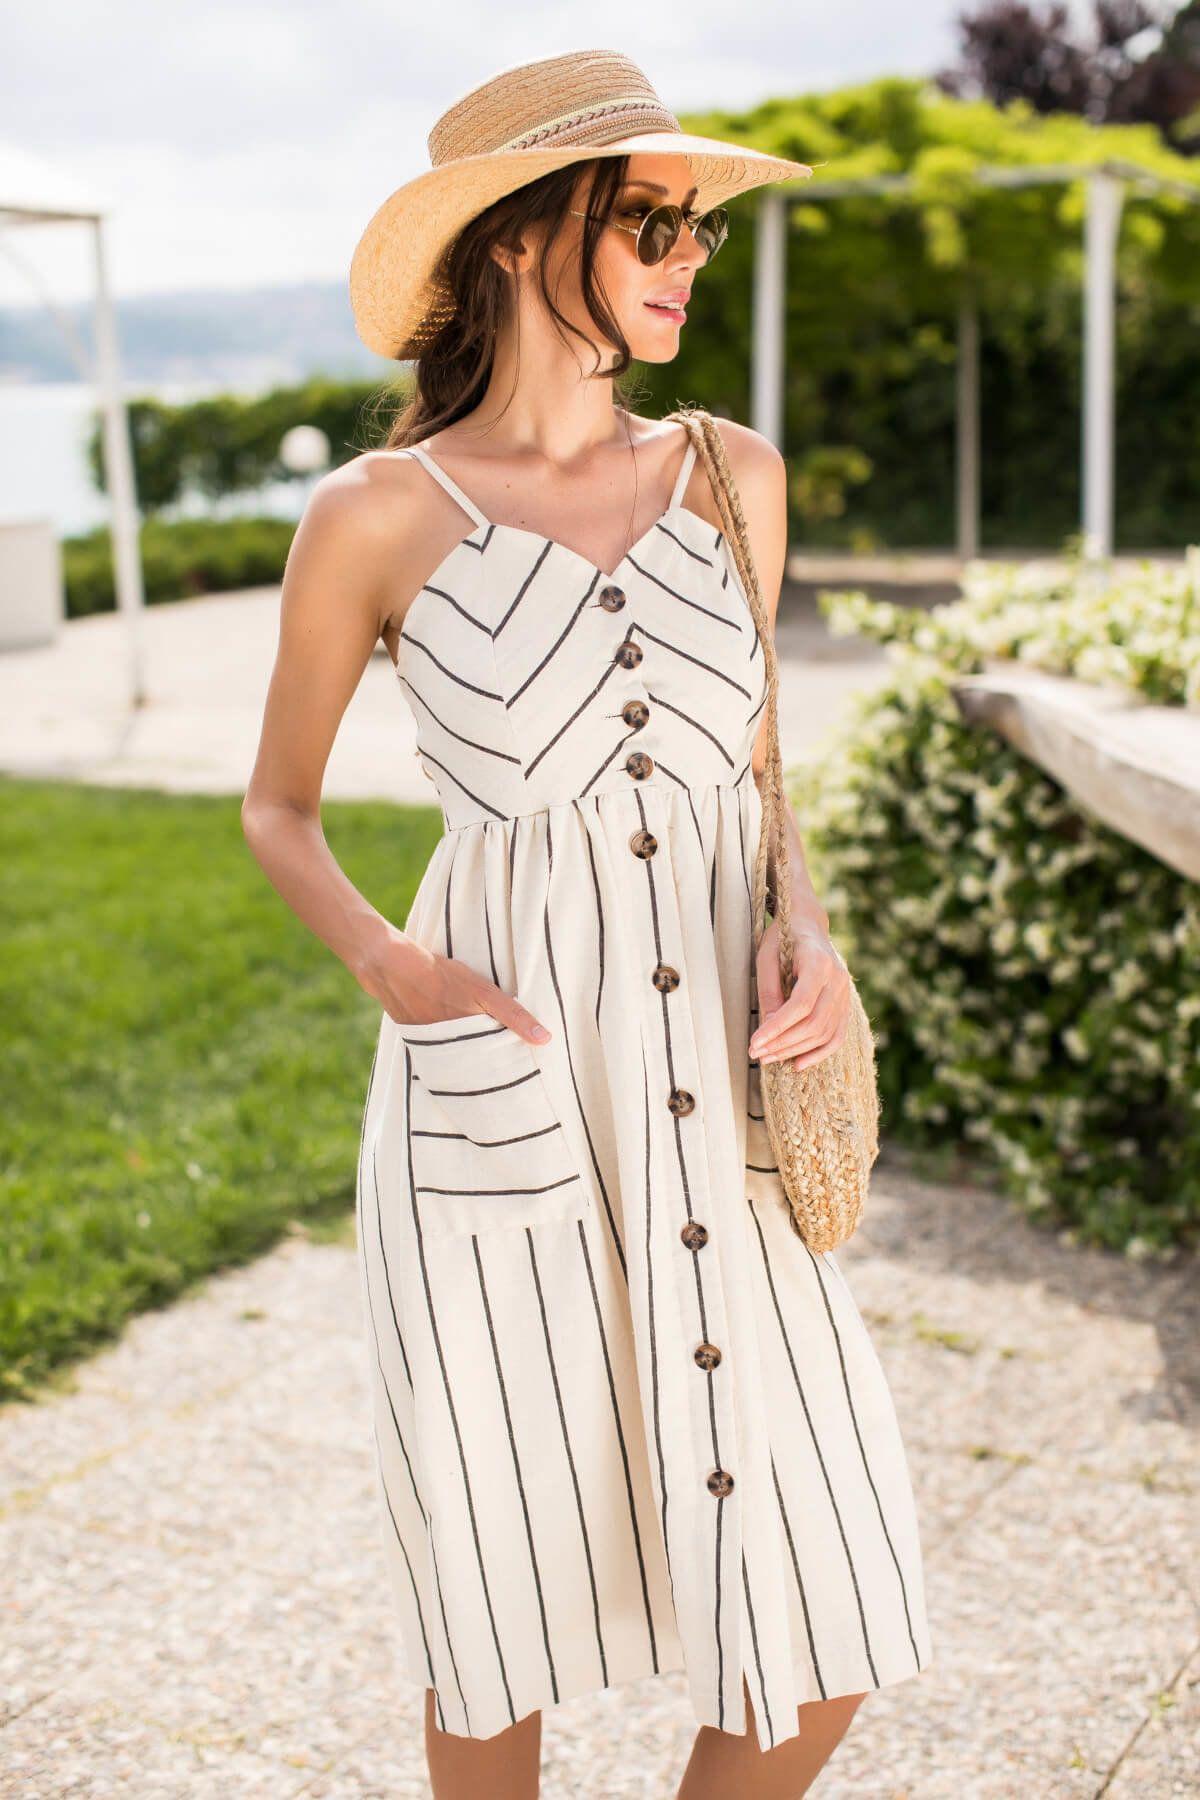 Kadin Bej Askili Dugmeli Keten Elbise Ps00007 Happiness Ist Trendyol Moda Stilleri Elbise Modelleri Elbise